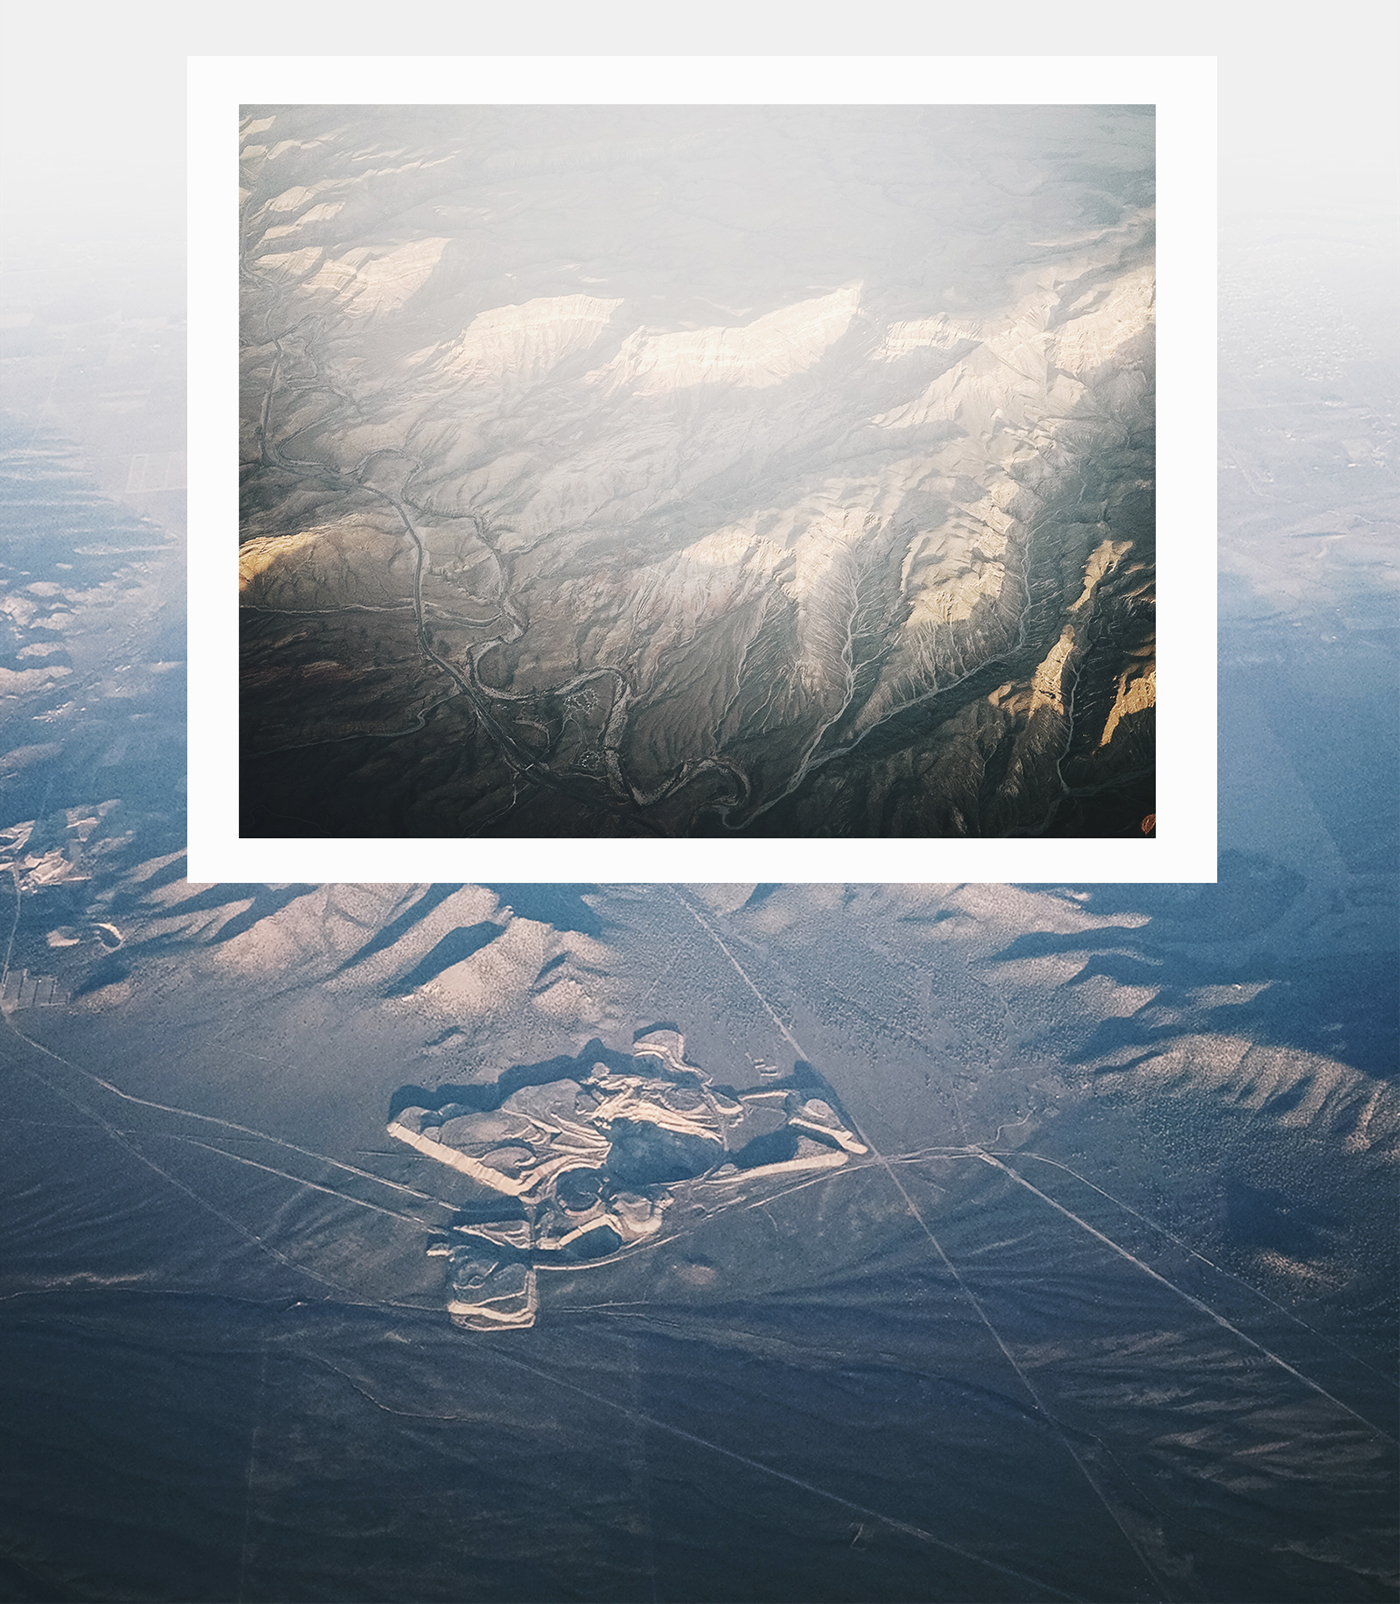 minimal nevada usa RoadTrip Aerial top Mockup free natural